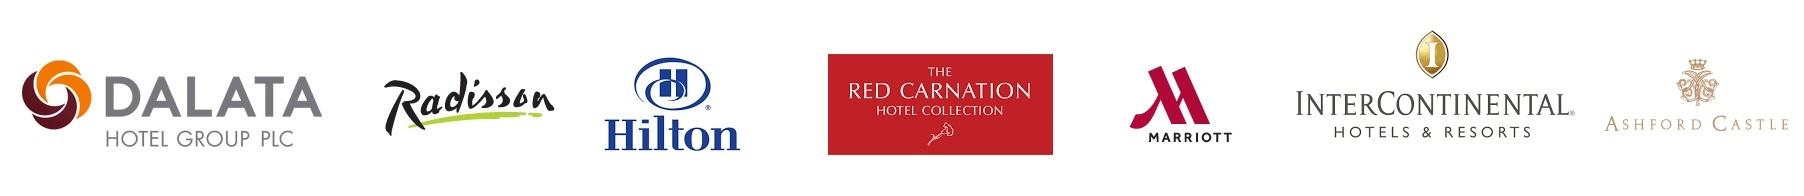 Intercontinental Hotels Group logo top staff hospitality recruitment